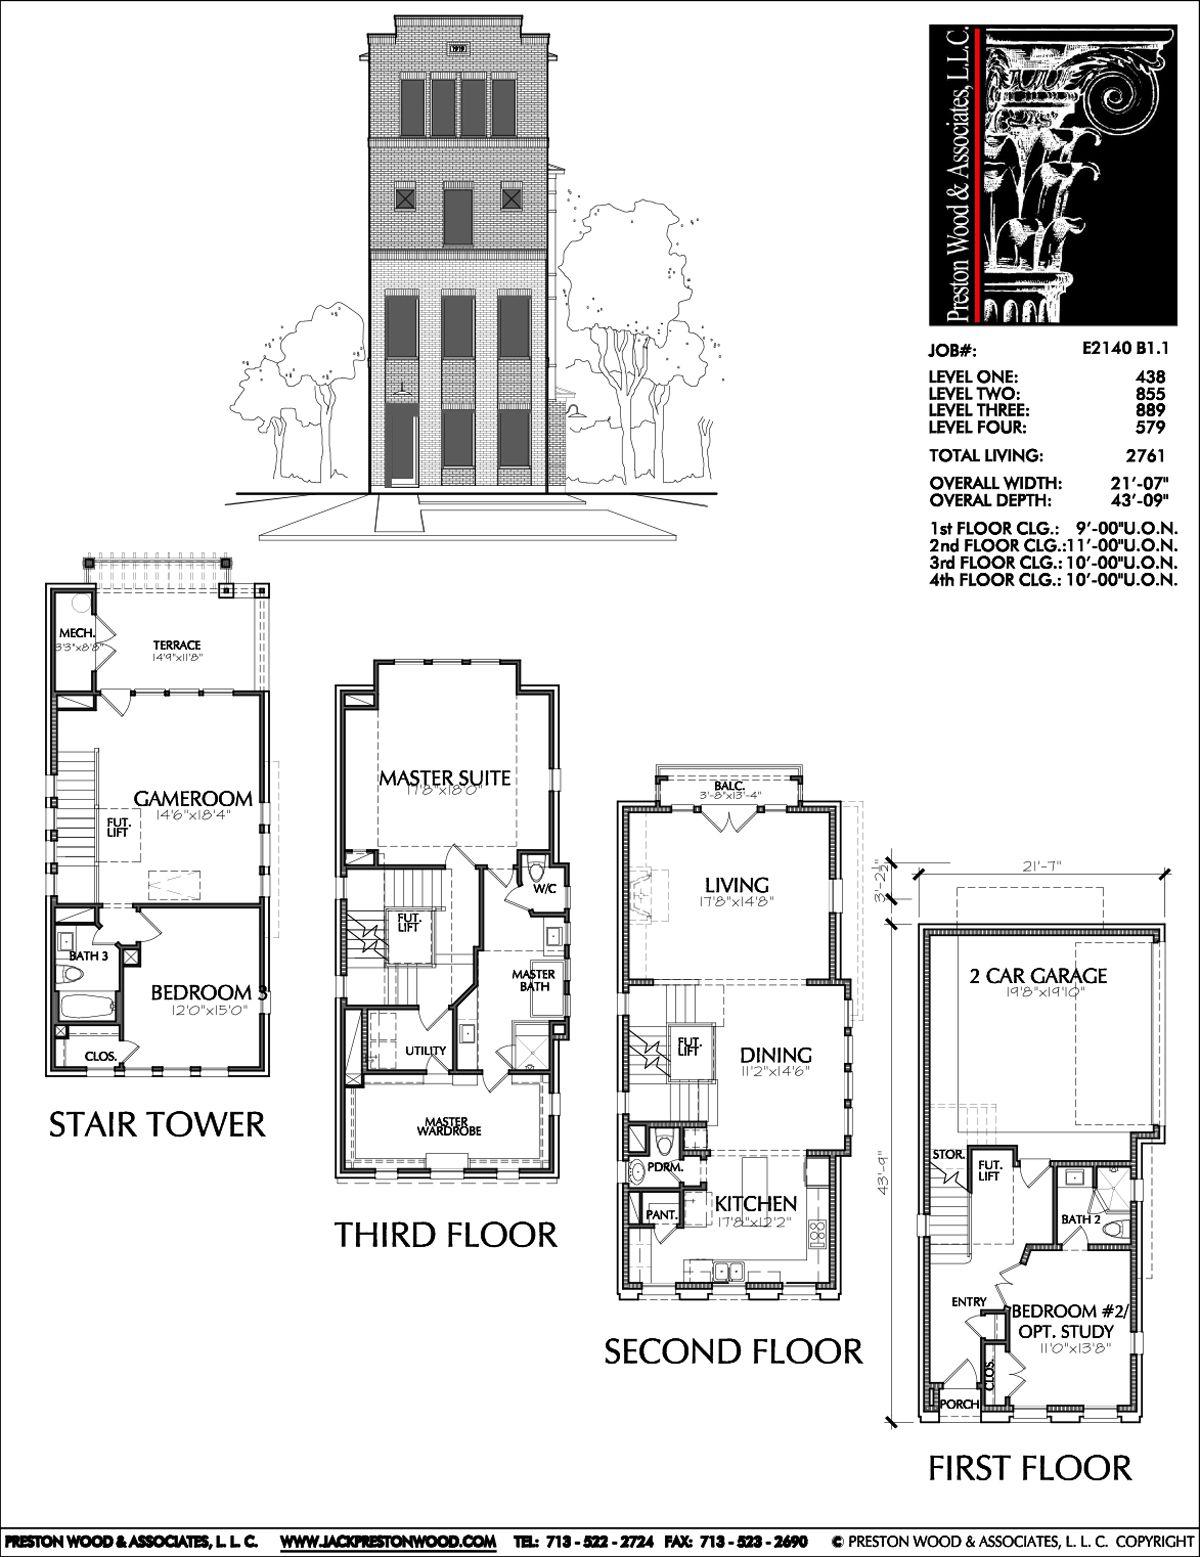 Four Story Townhouse Plan E2140 B1 1 Floor Plans House Floor Plans House Plans